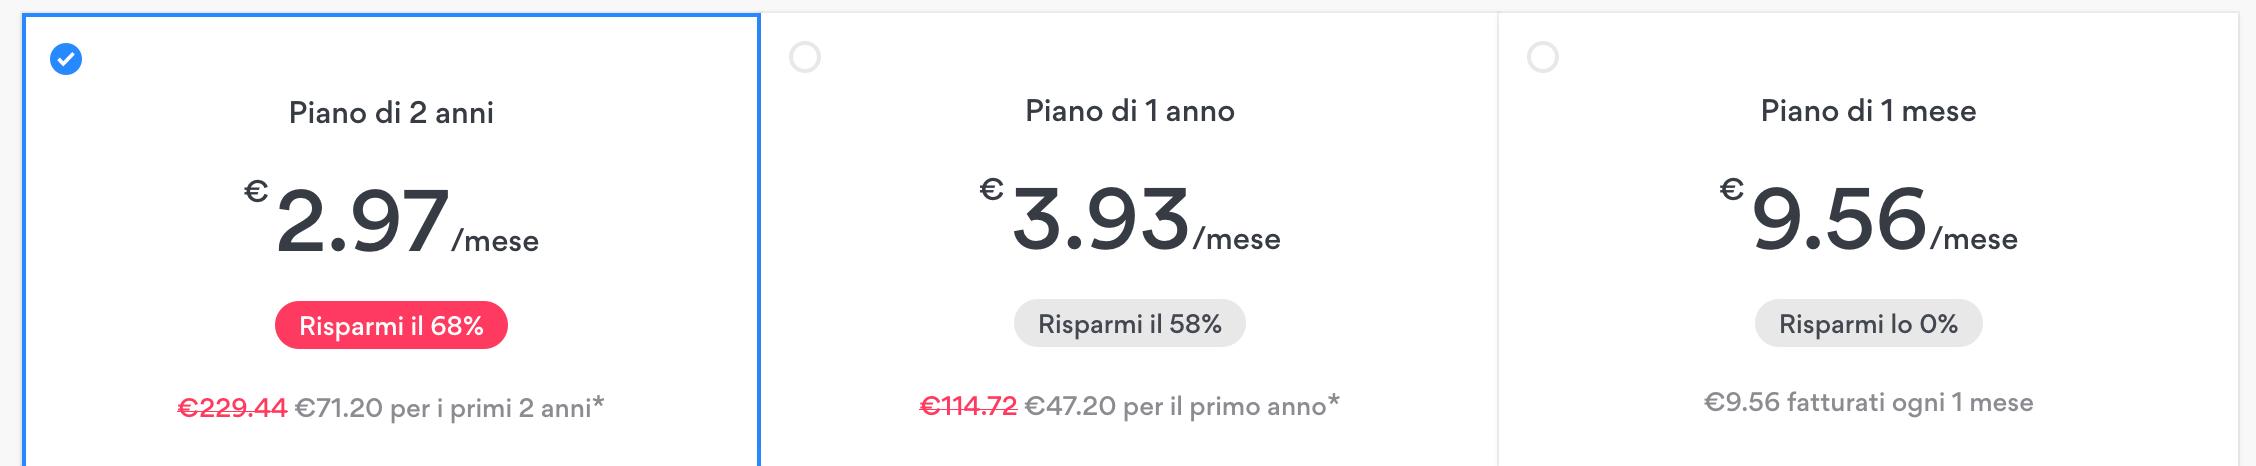 nordvpn prezzo